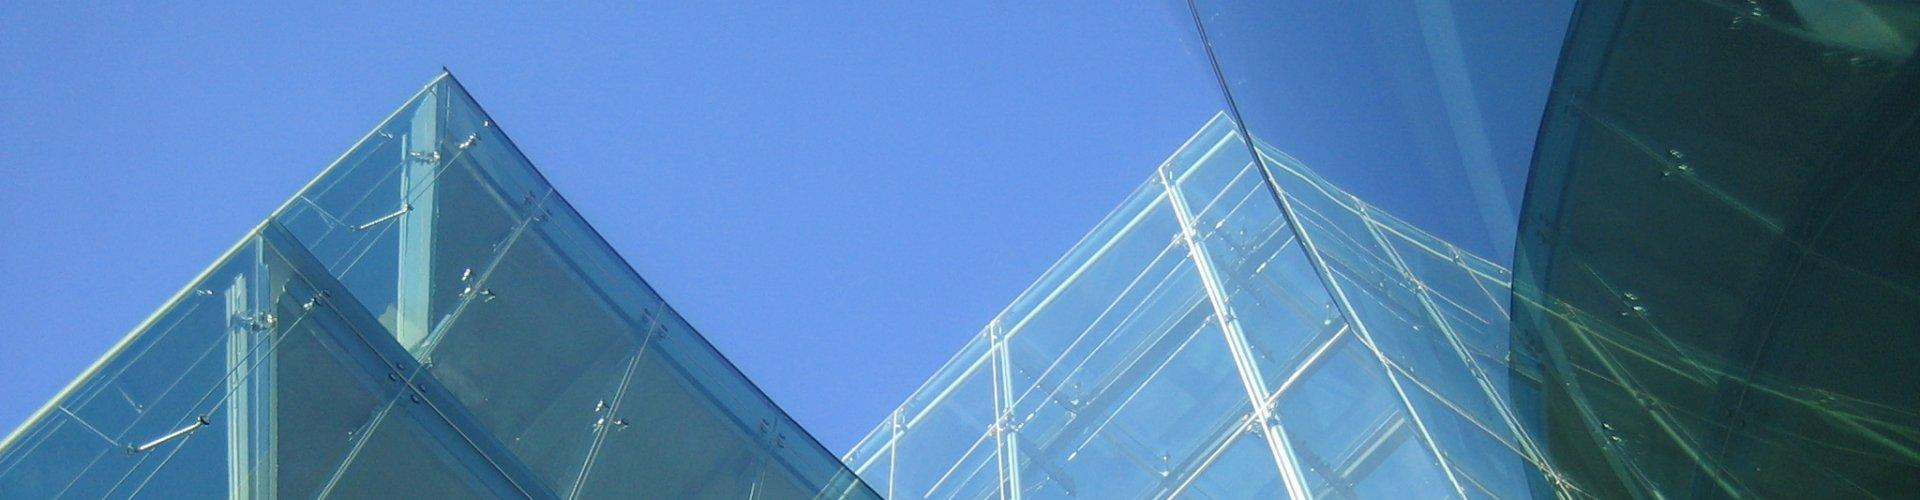 Zonwerend raamfolie op een pand in Dublin